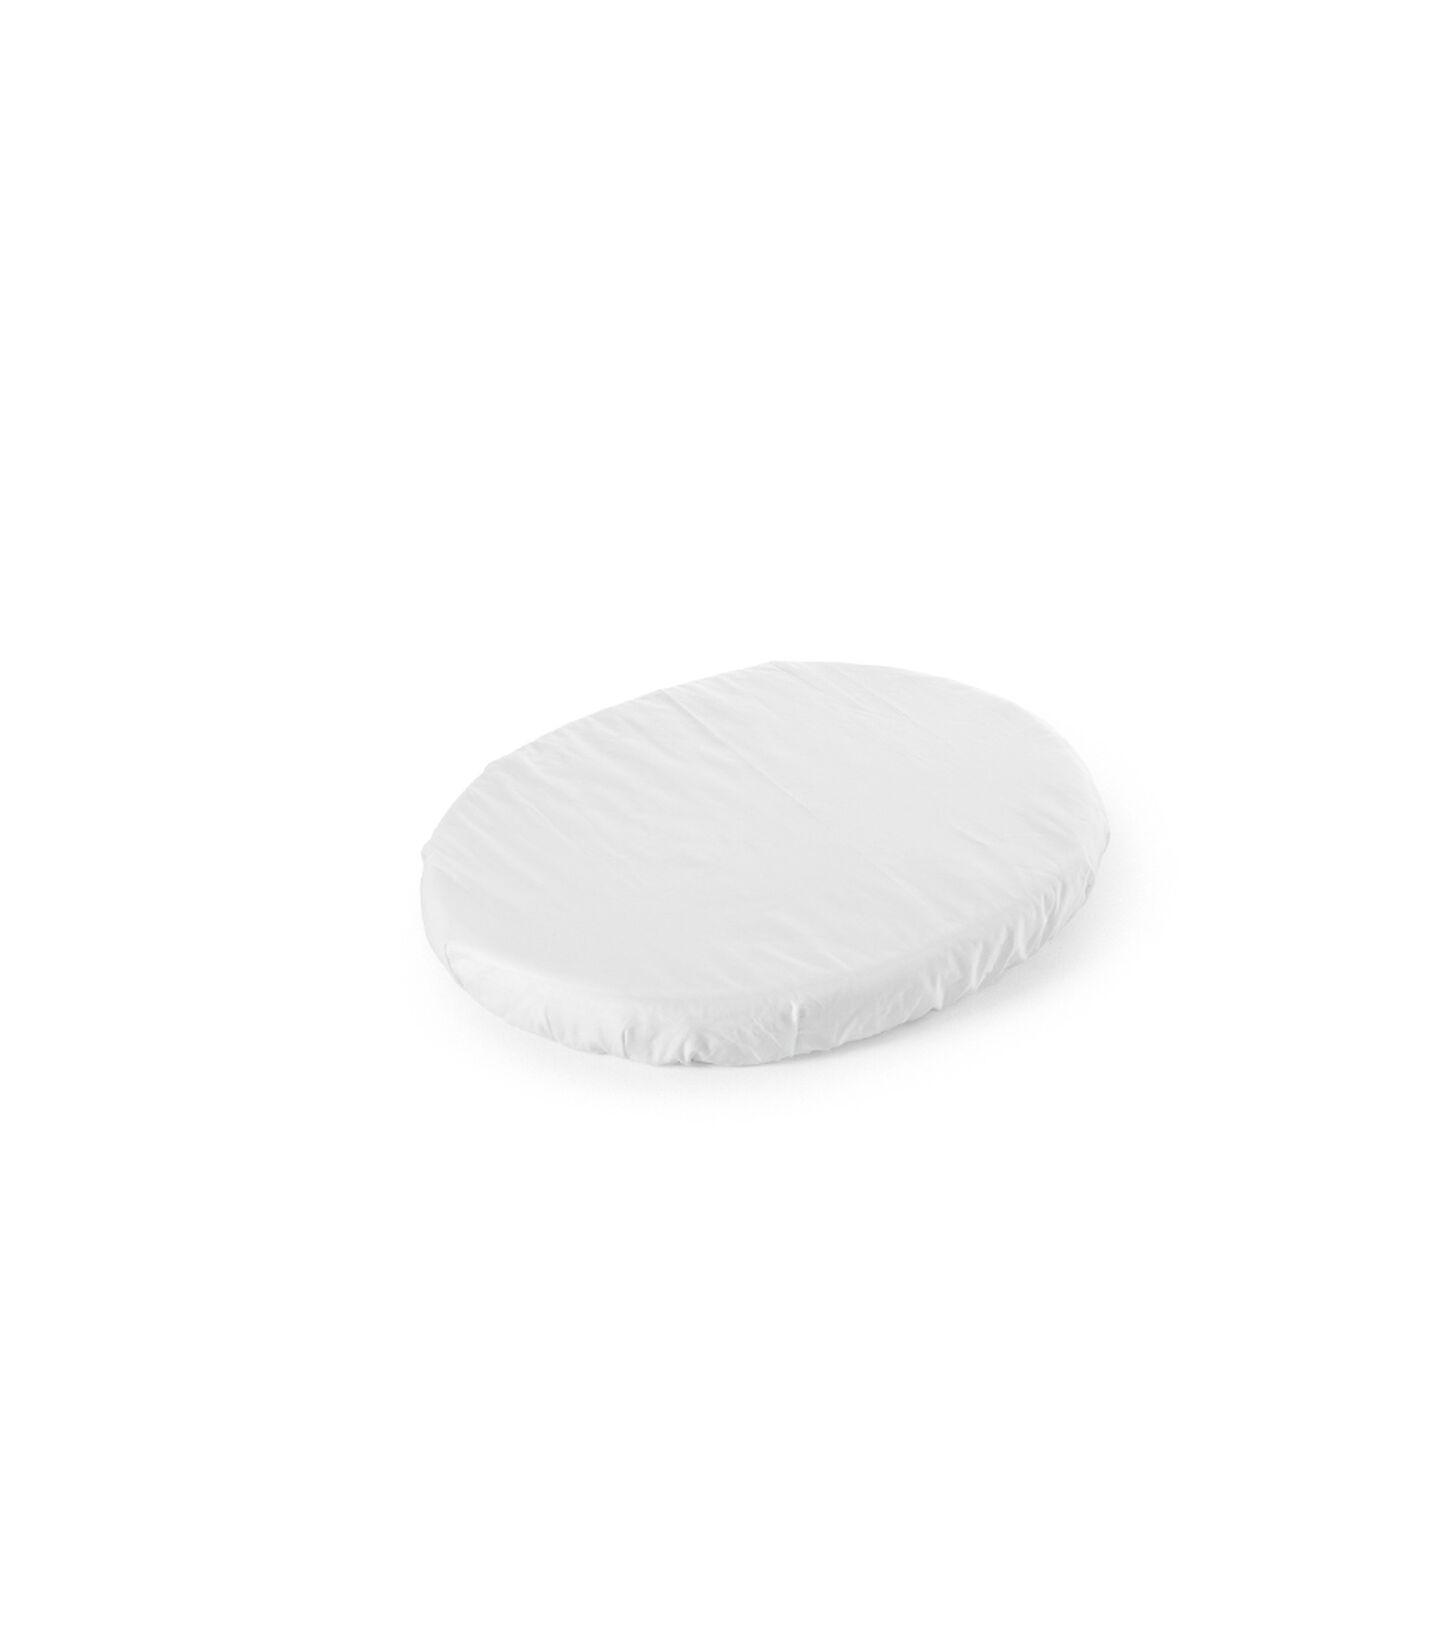 Stokke® Sleepi™ Mini Fitted Sheet, White. view 2